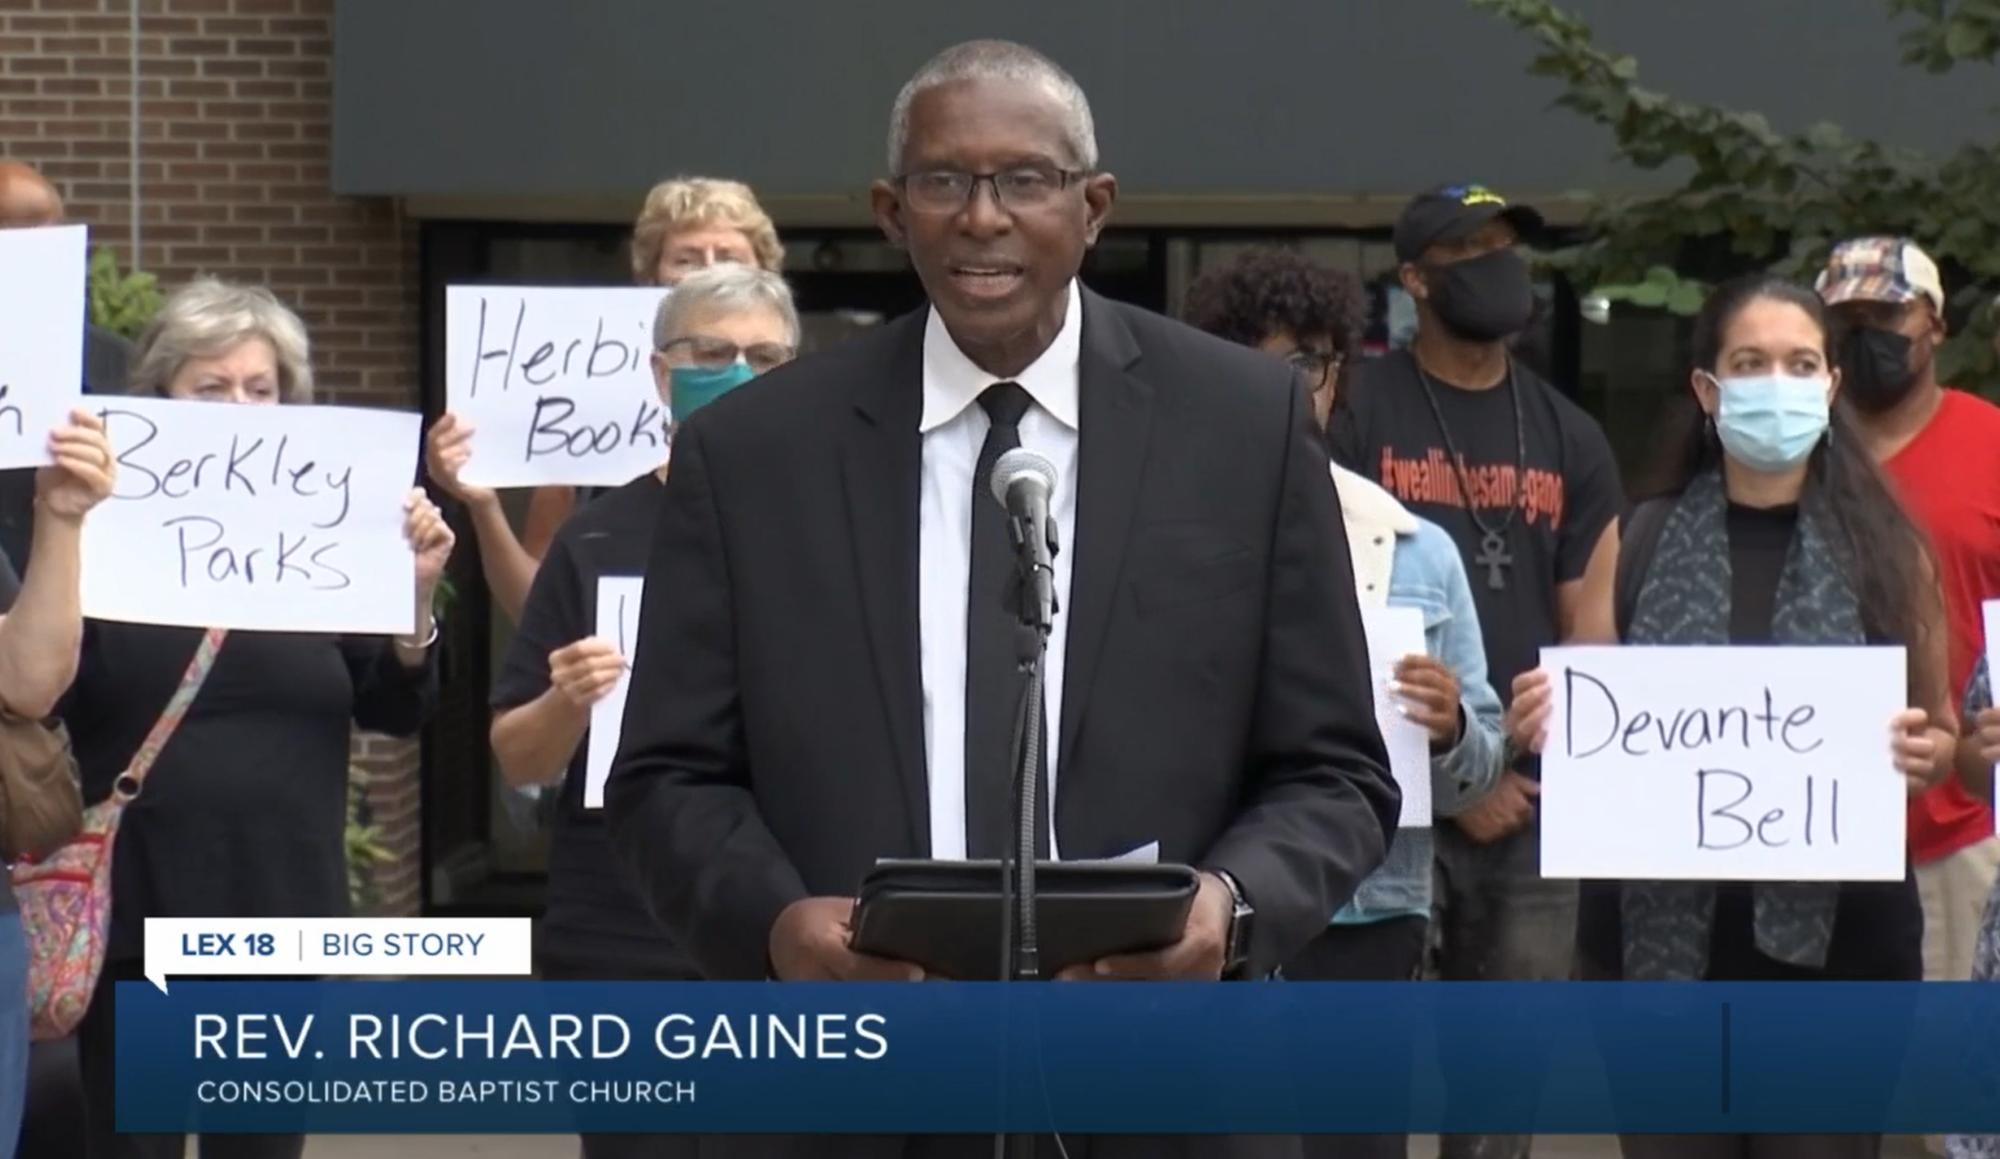 Lexington faith leaders make plea: 'The violence must stop'